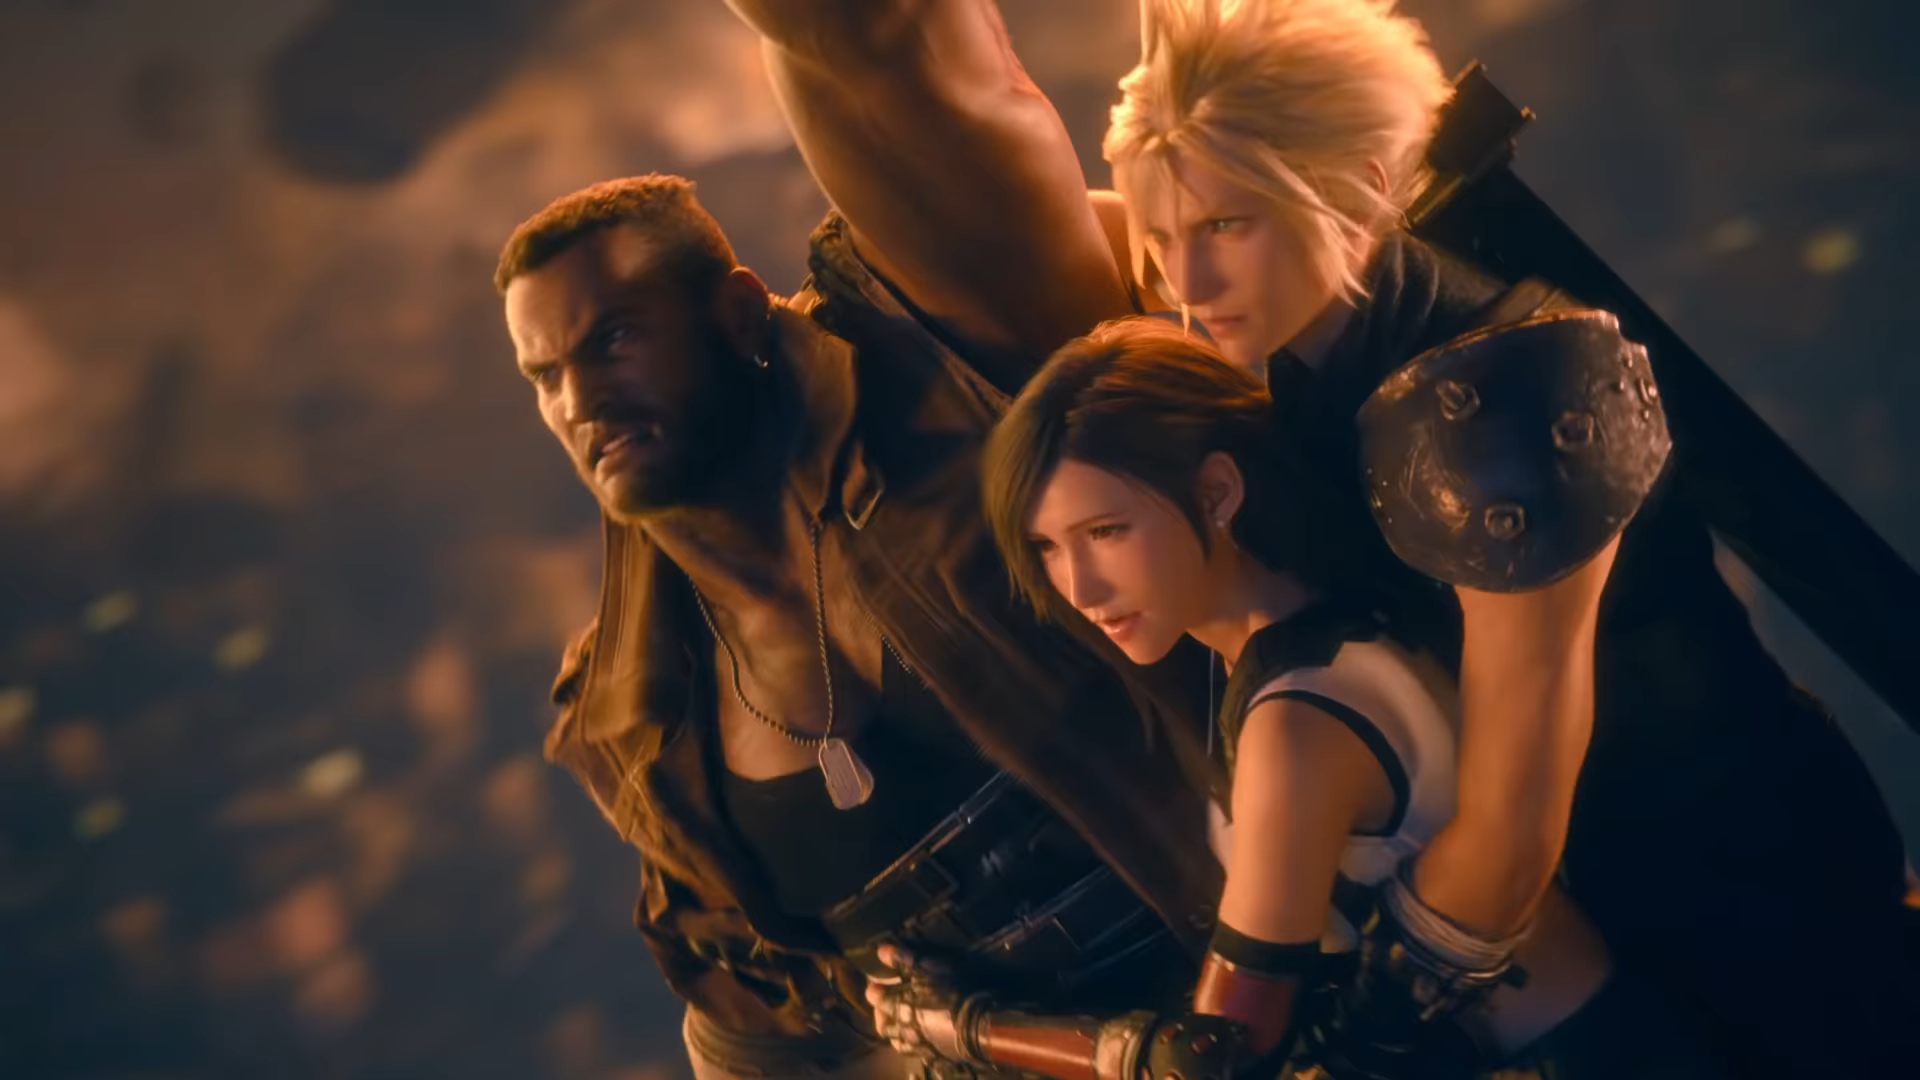 Pin By Summerflower On Final Fantasy Vii Final Fantasy Cloud Strife Final Fantasy Cloud Final Fantasy